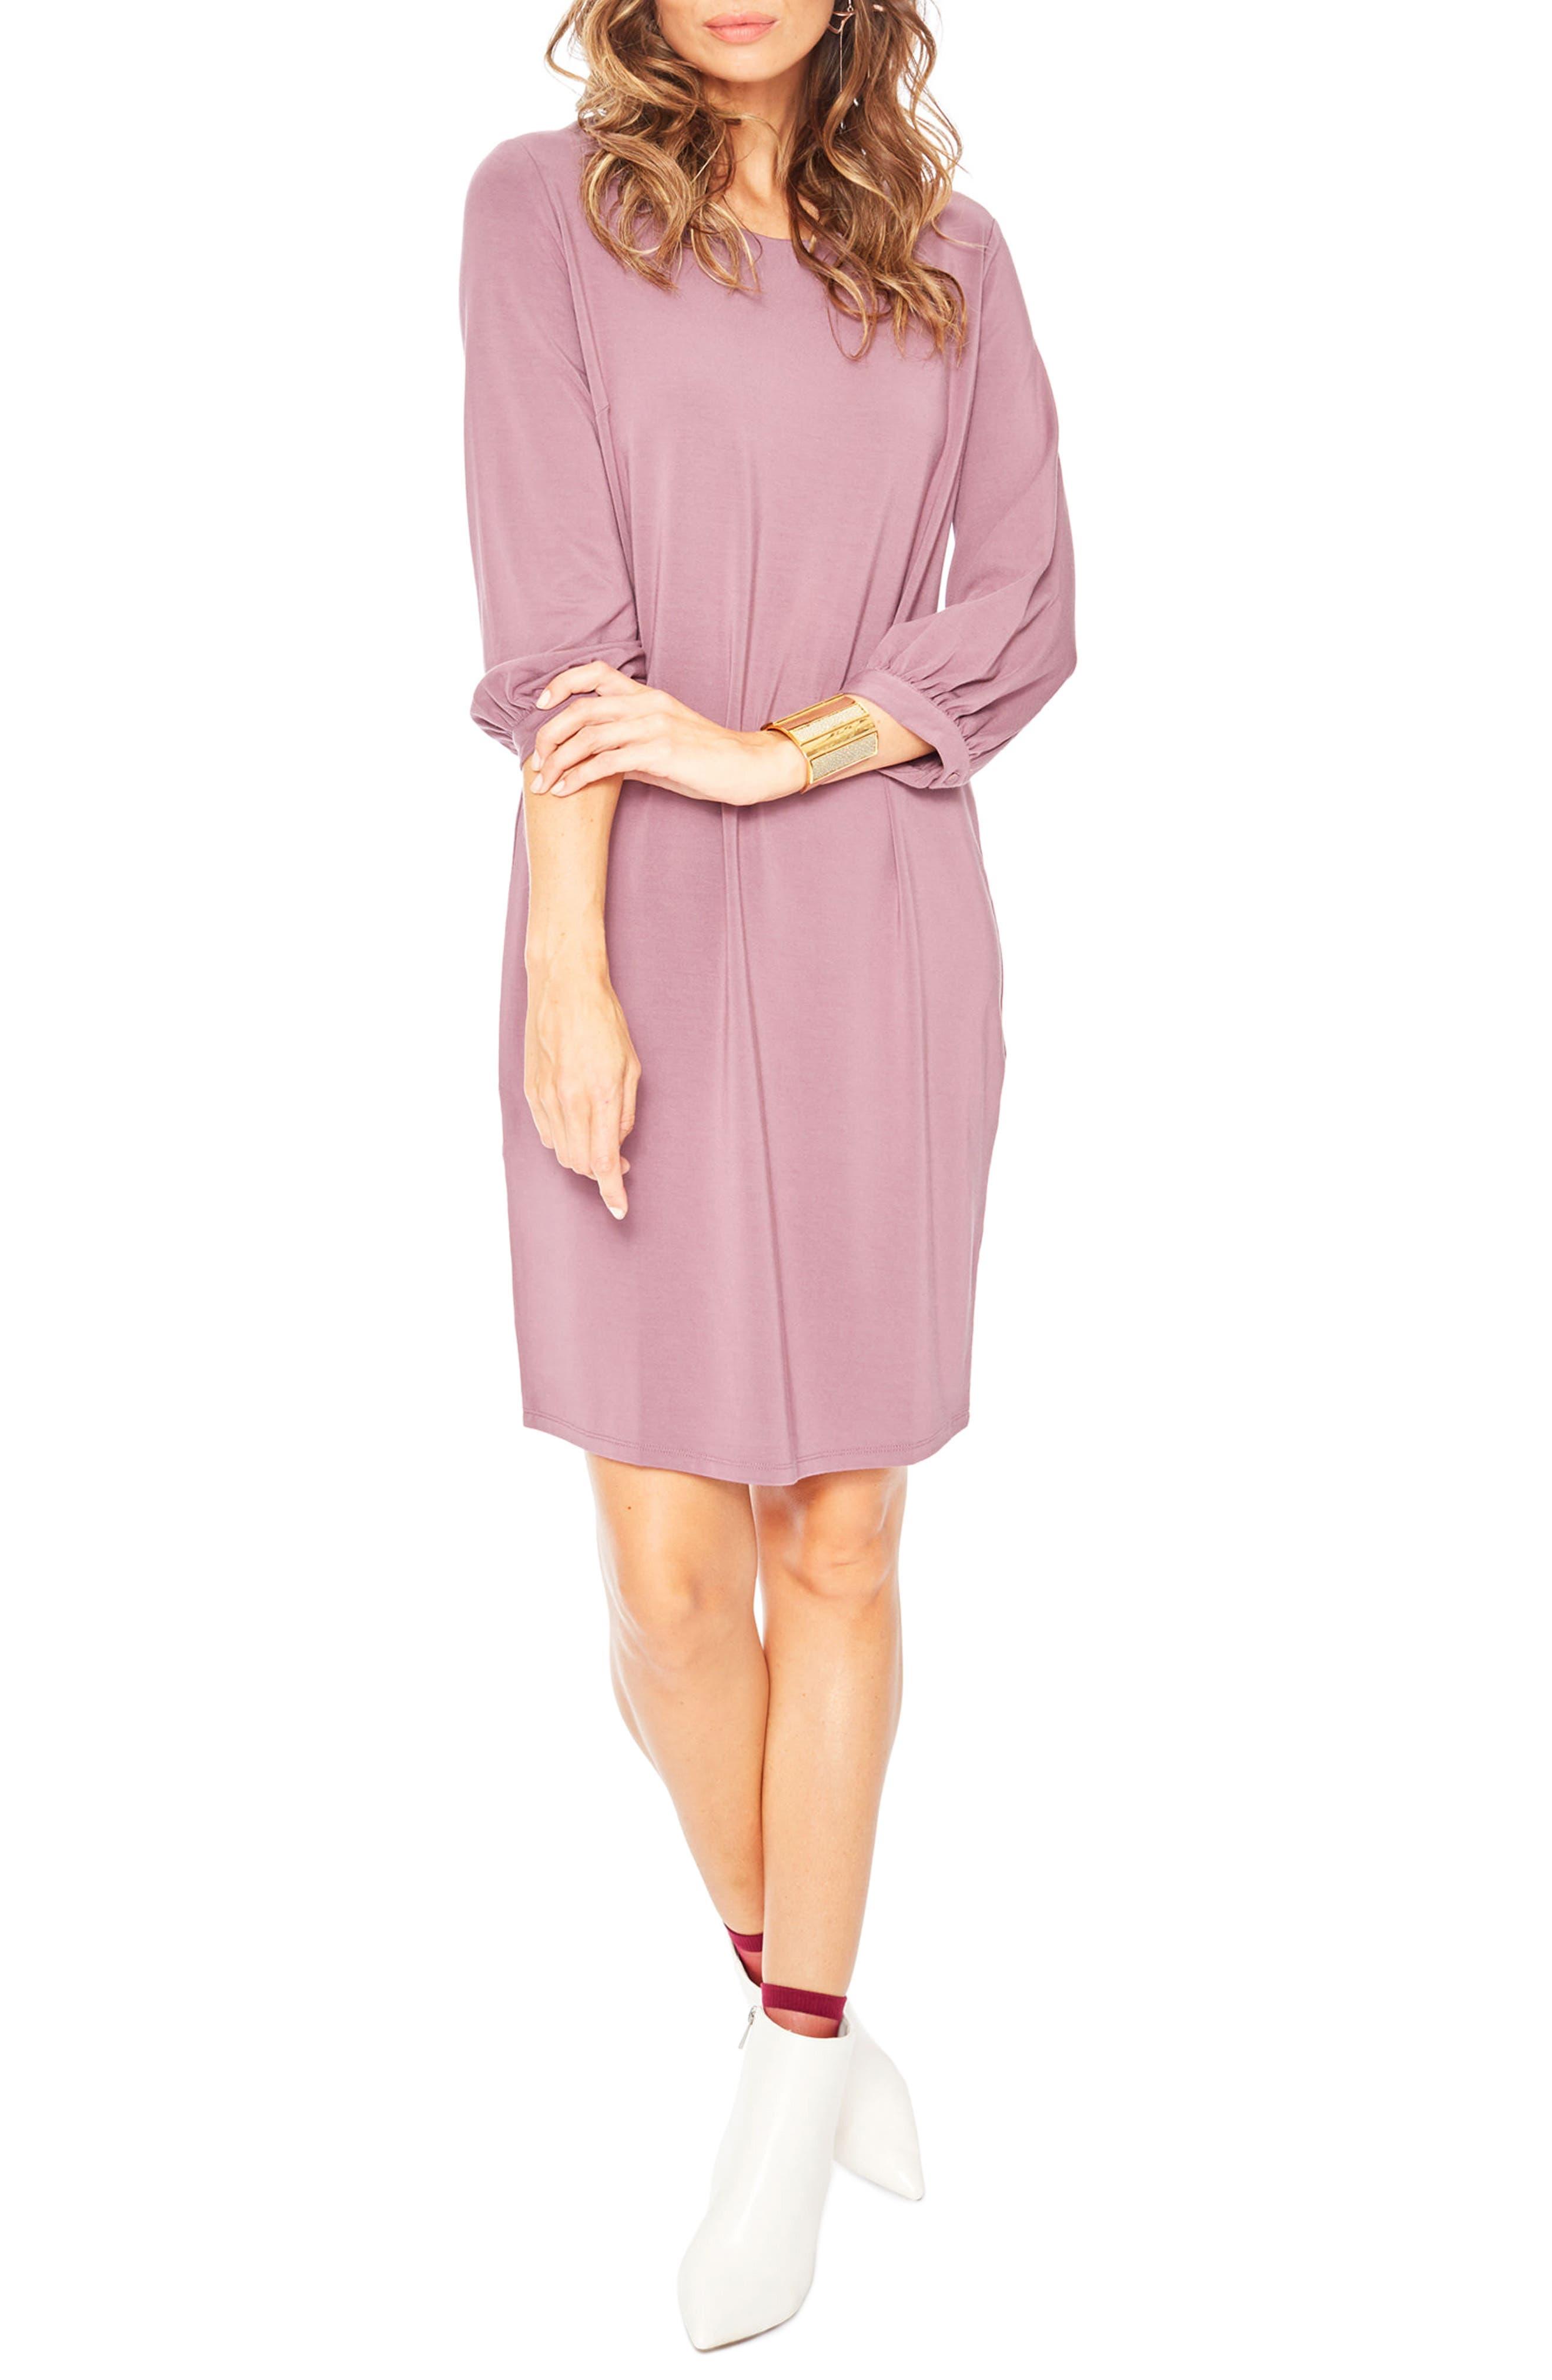 'Hampton' Maternity Dress,                             Main thumbnail 1, color,                             680